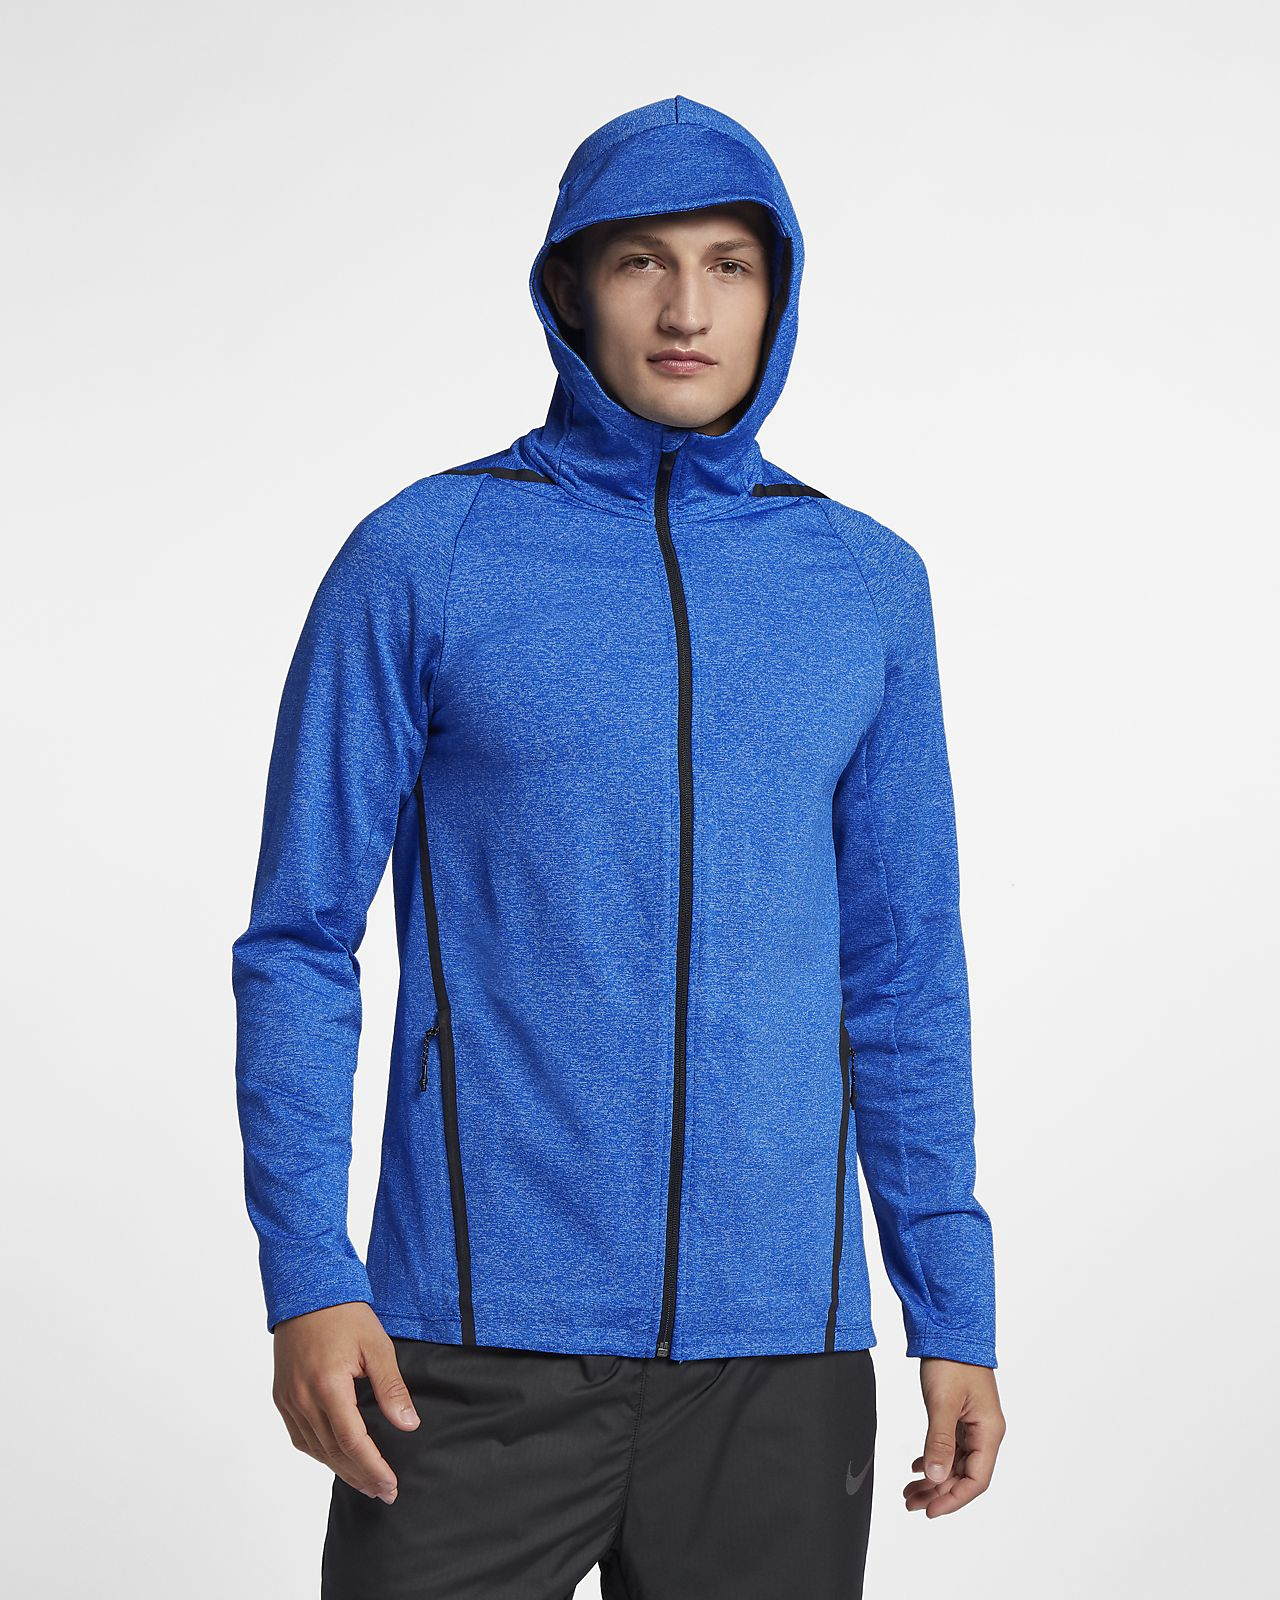 d22ab311 Nike Dri-FIT Men's Long-Sleeve Full-Zip Training Hoodie. Nike.com CA